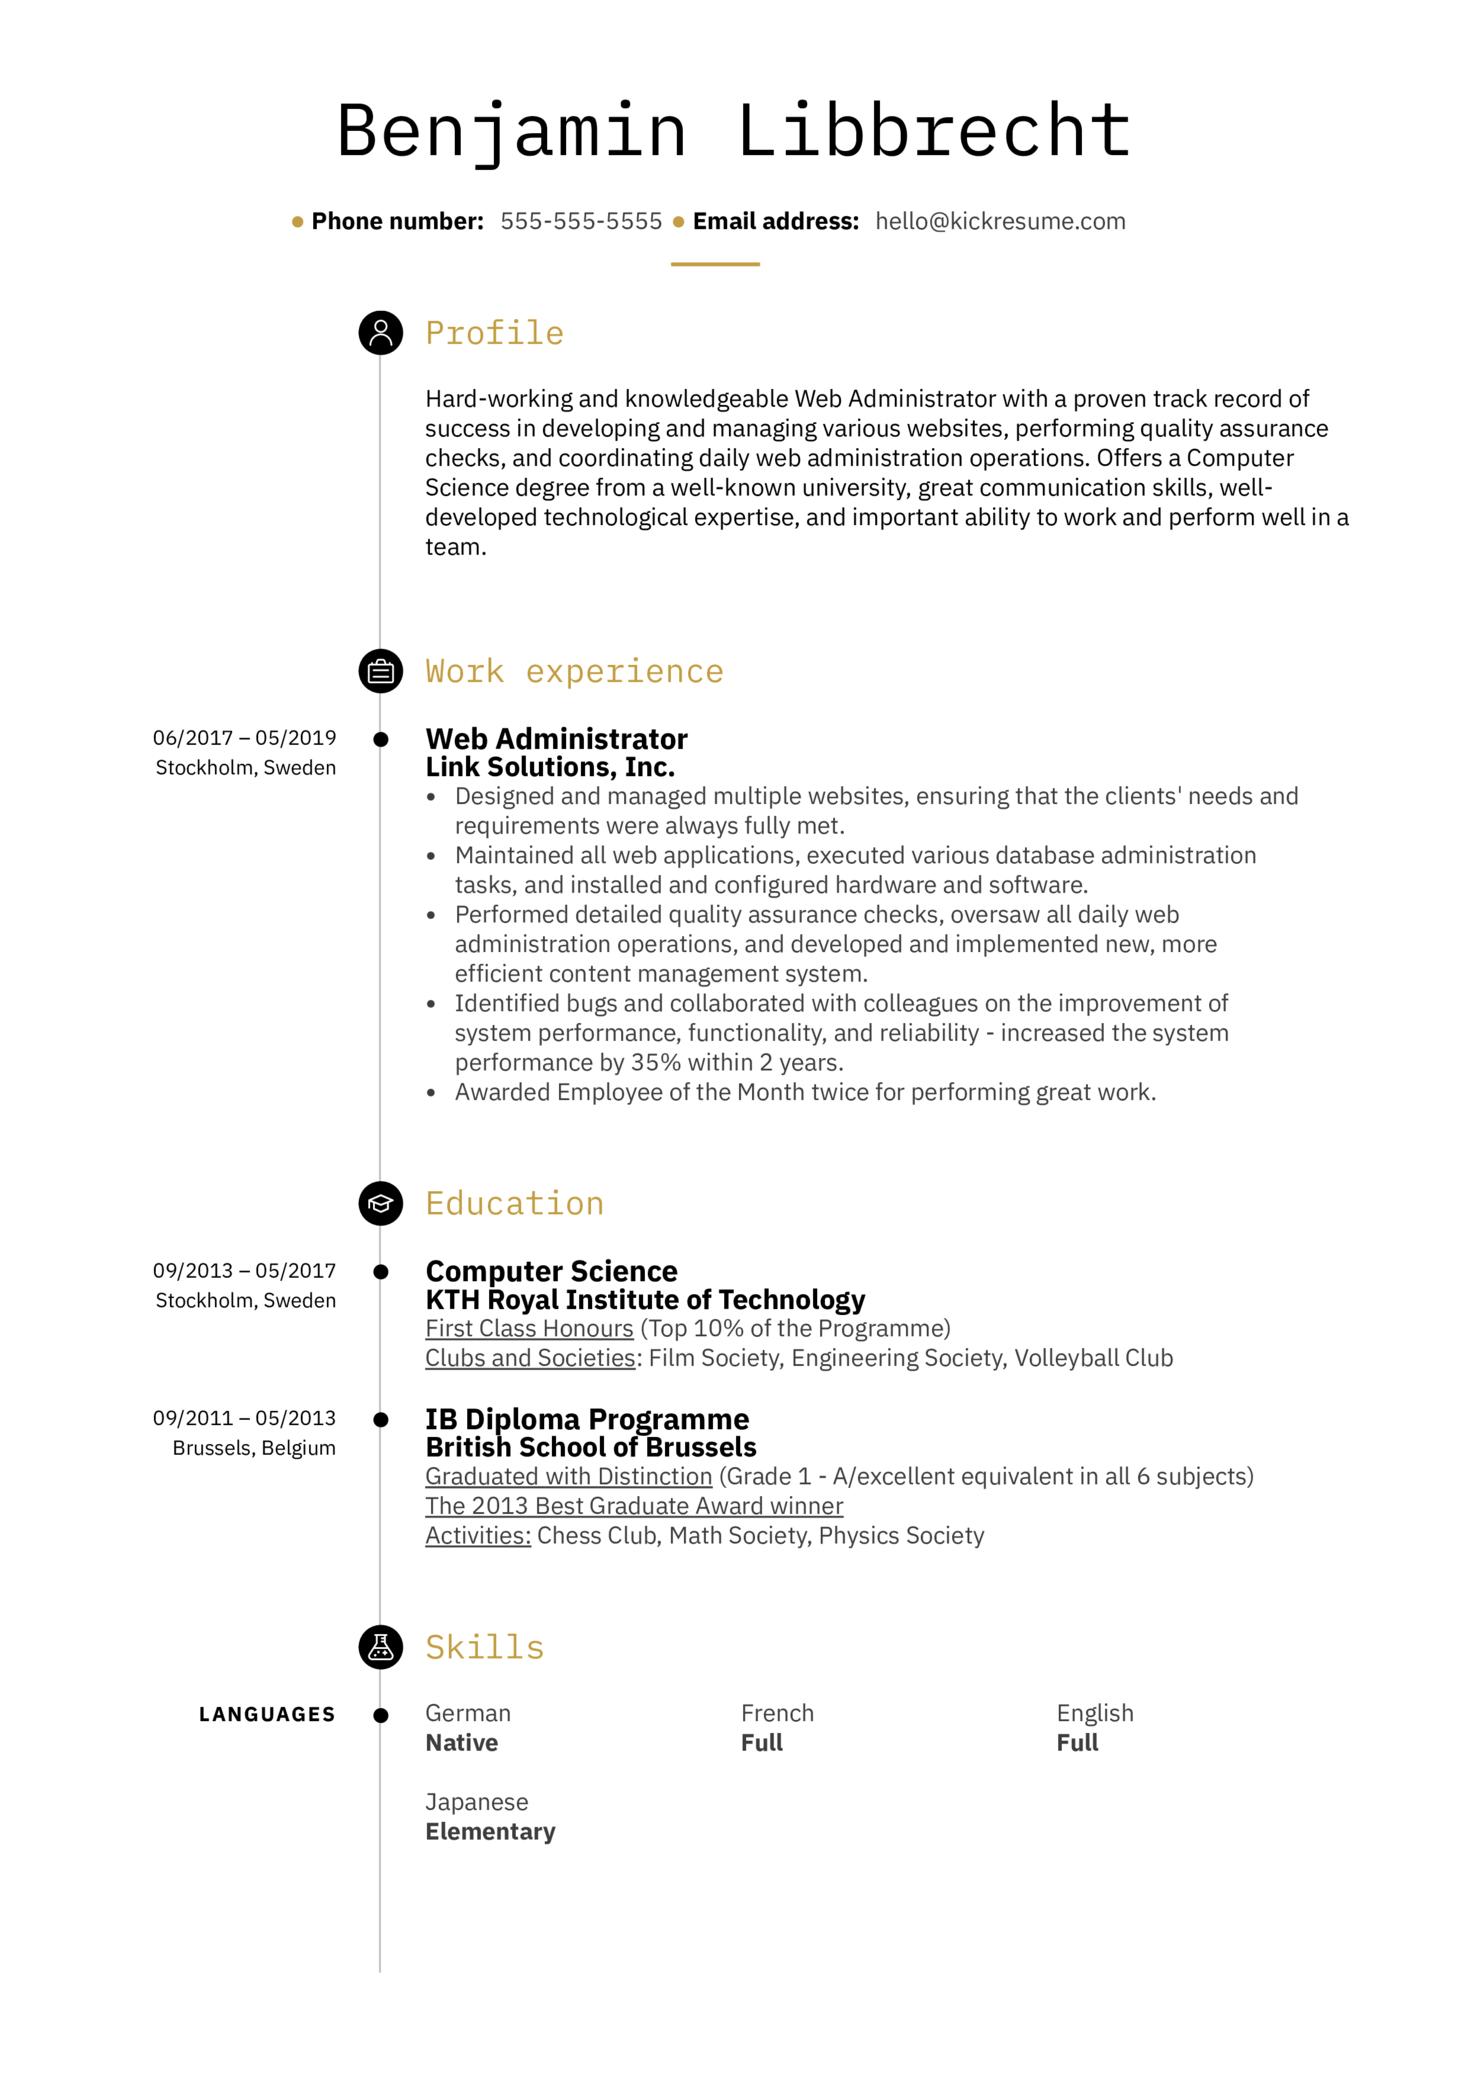 Web Administrator Resume Sample (Part 1)